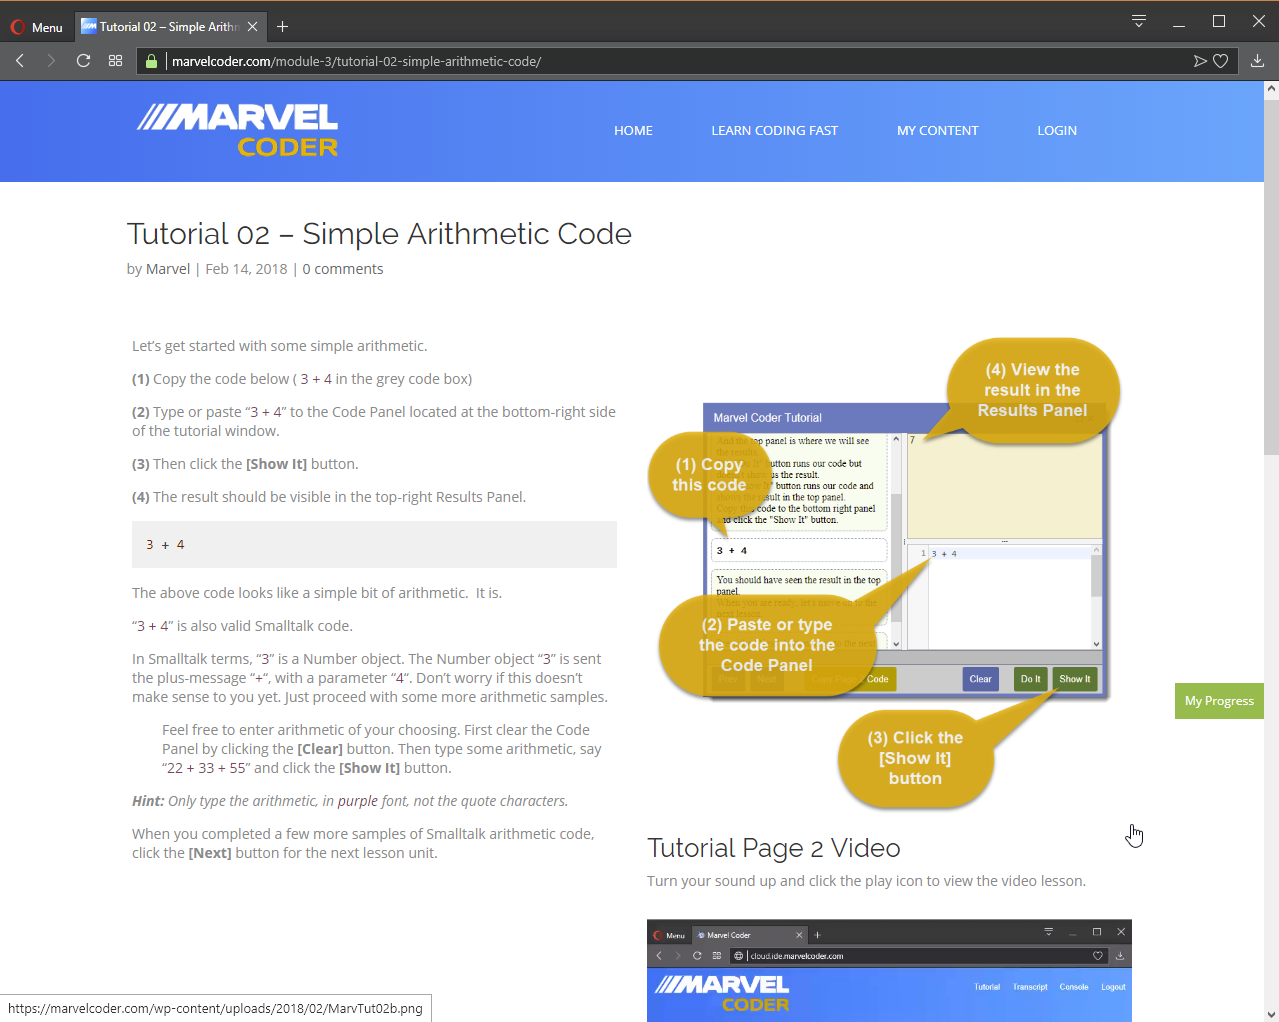 MarvelCoder — Learn Coding Fast, Development Software Screenshot